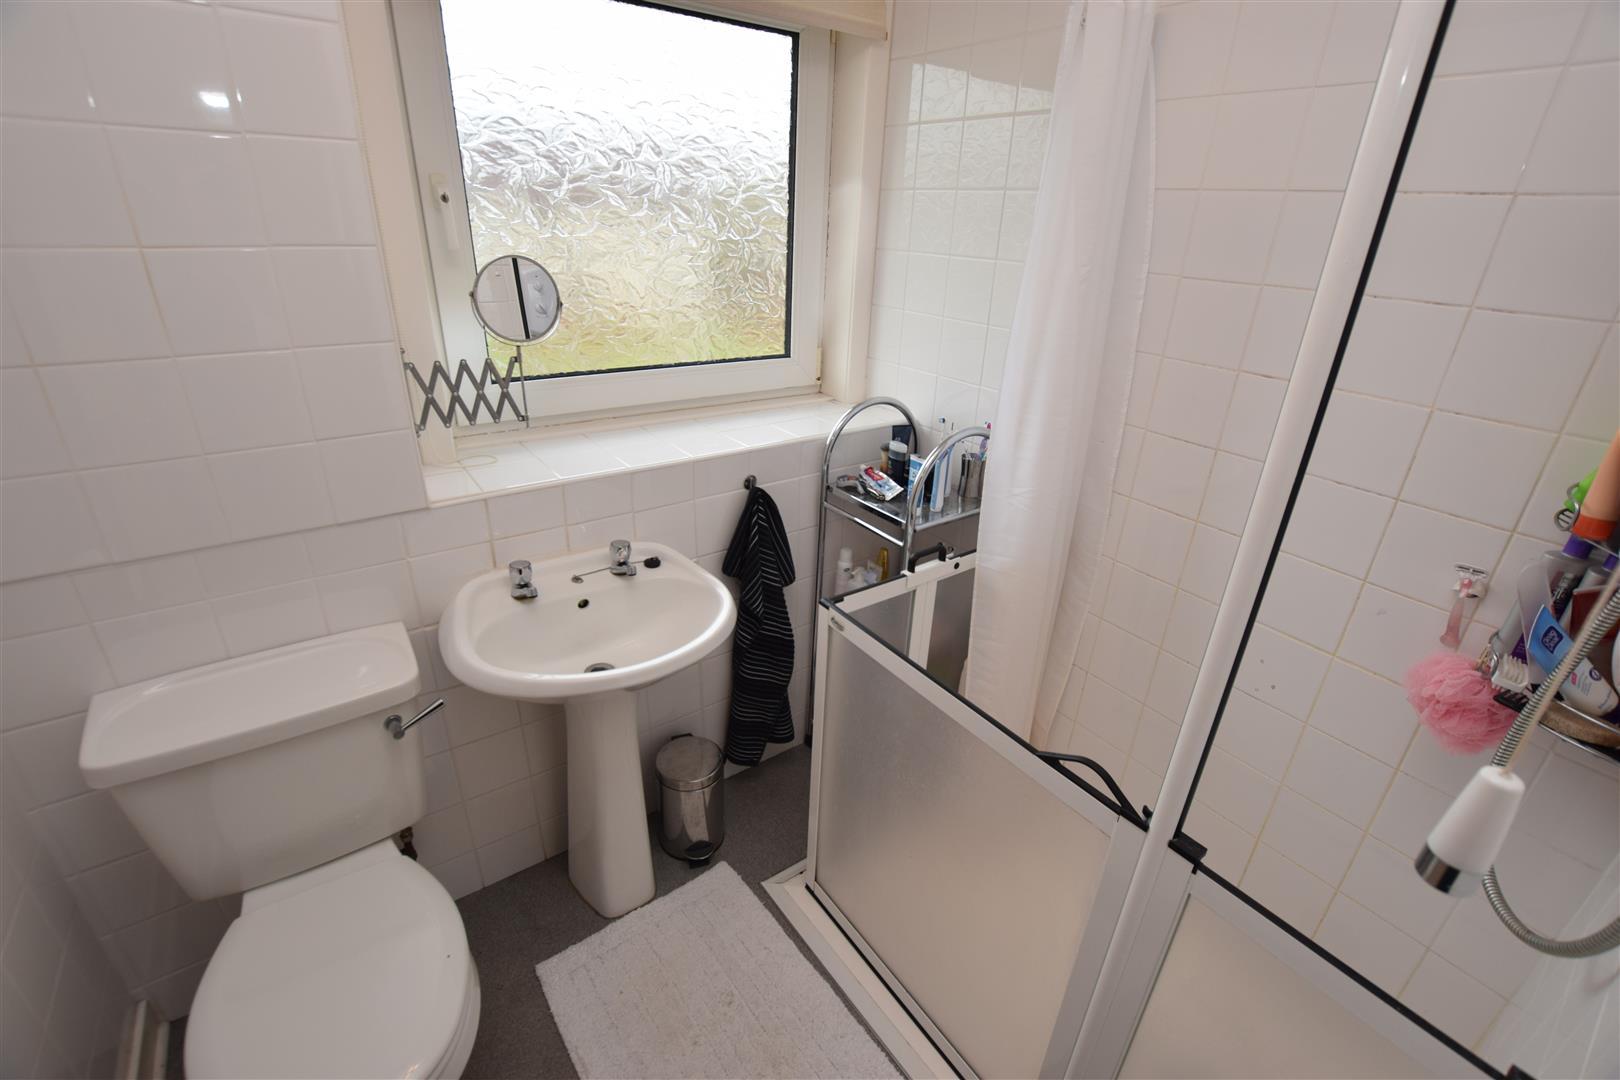 13, Pullar Terrace, Perth, Perthshire, PH1 2QF, UK